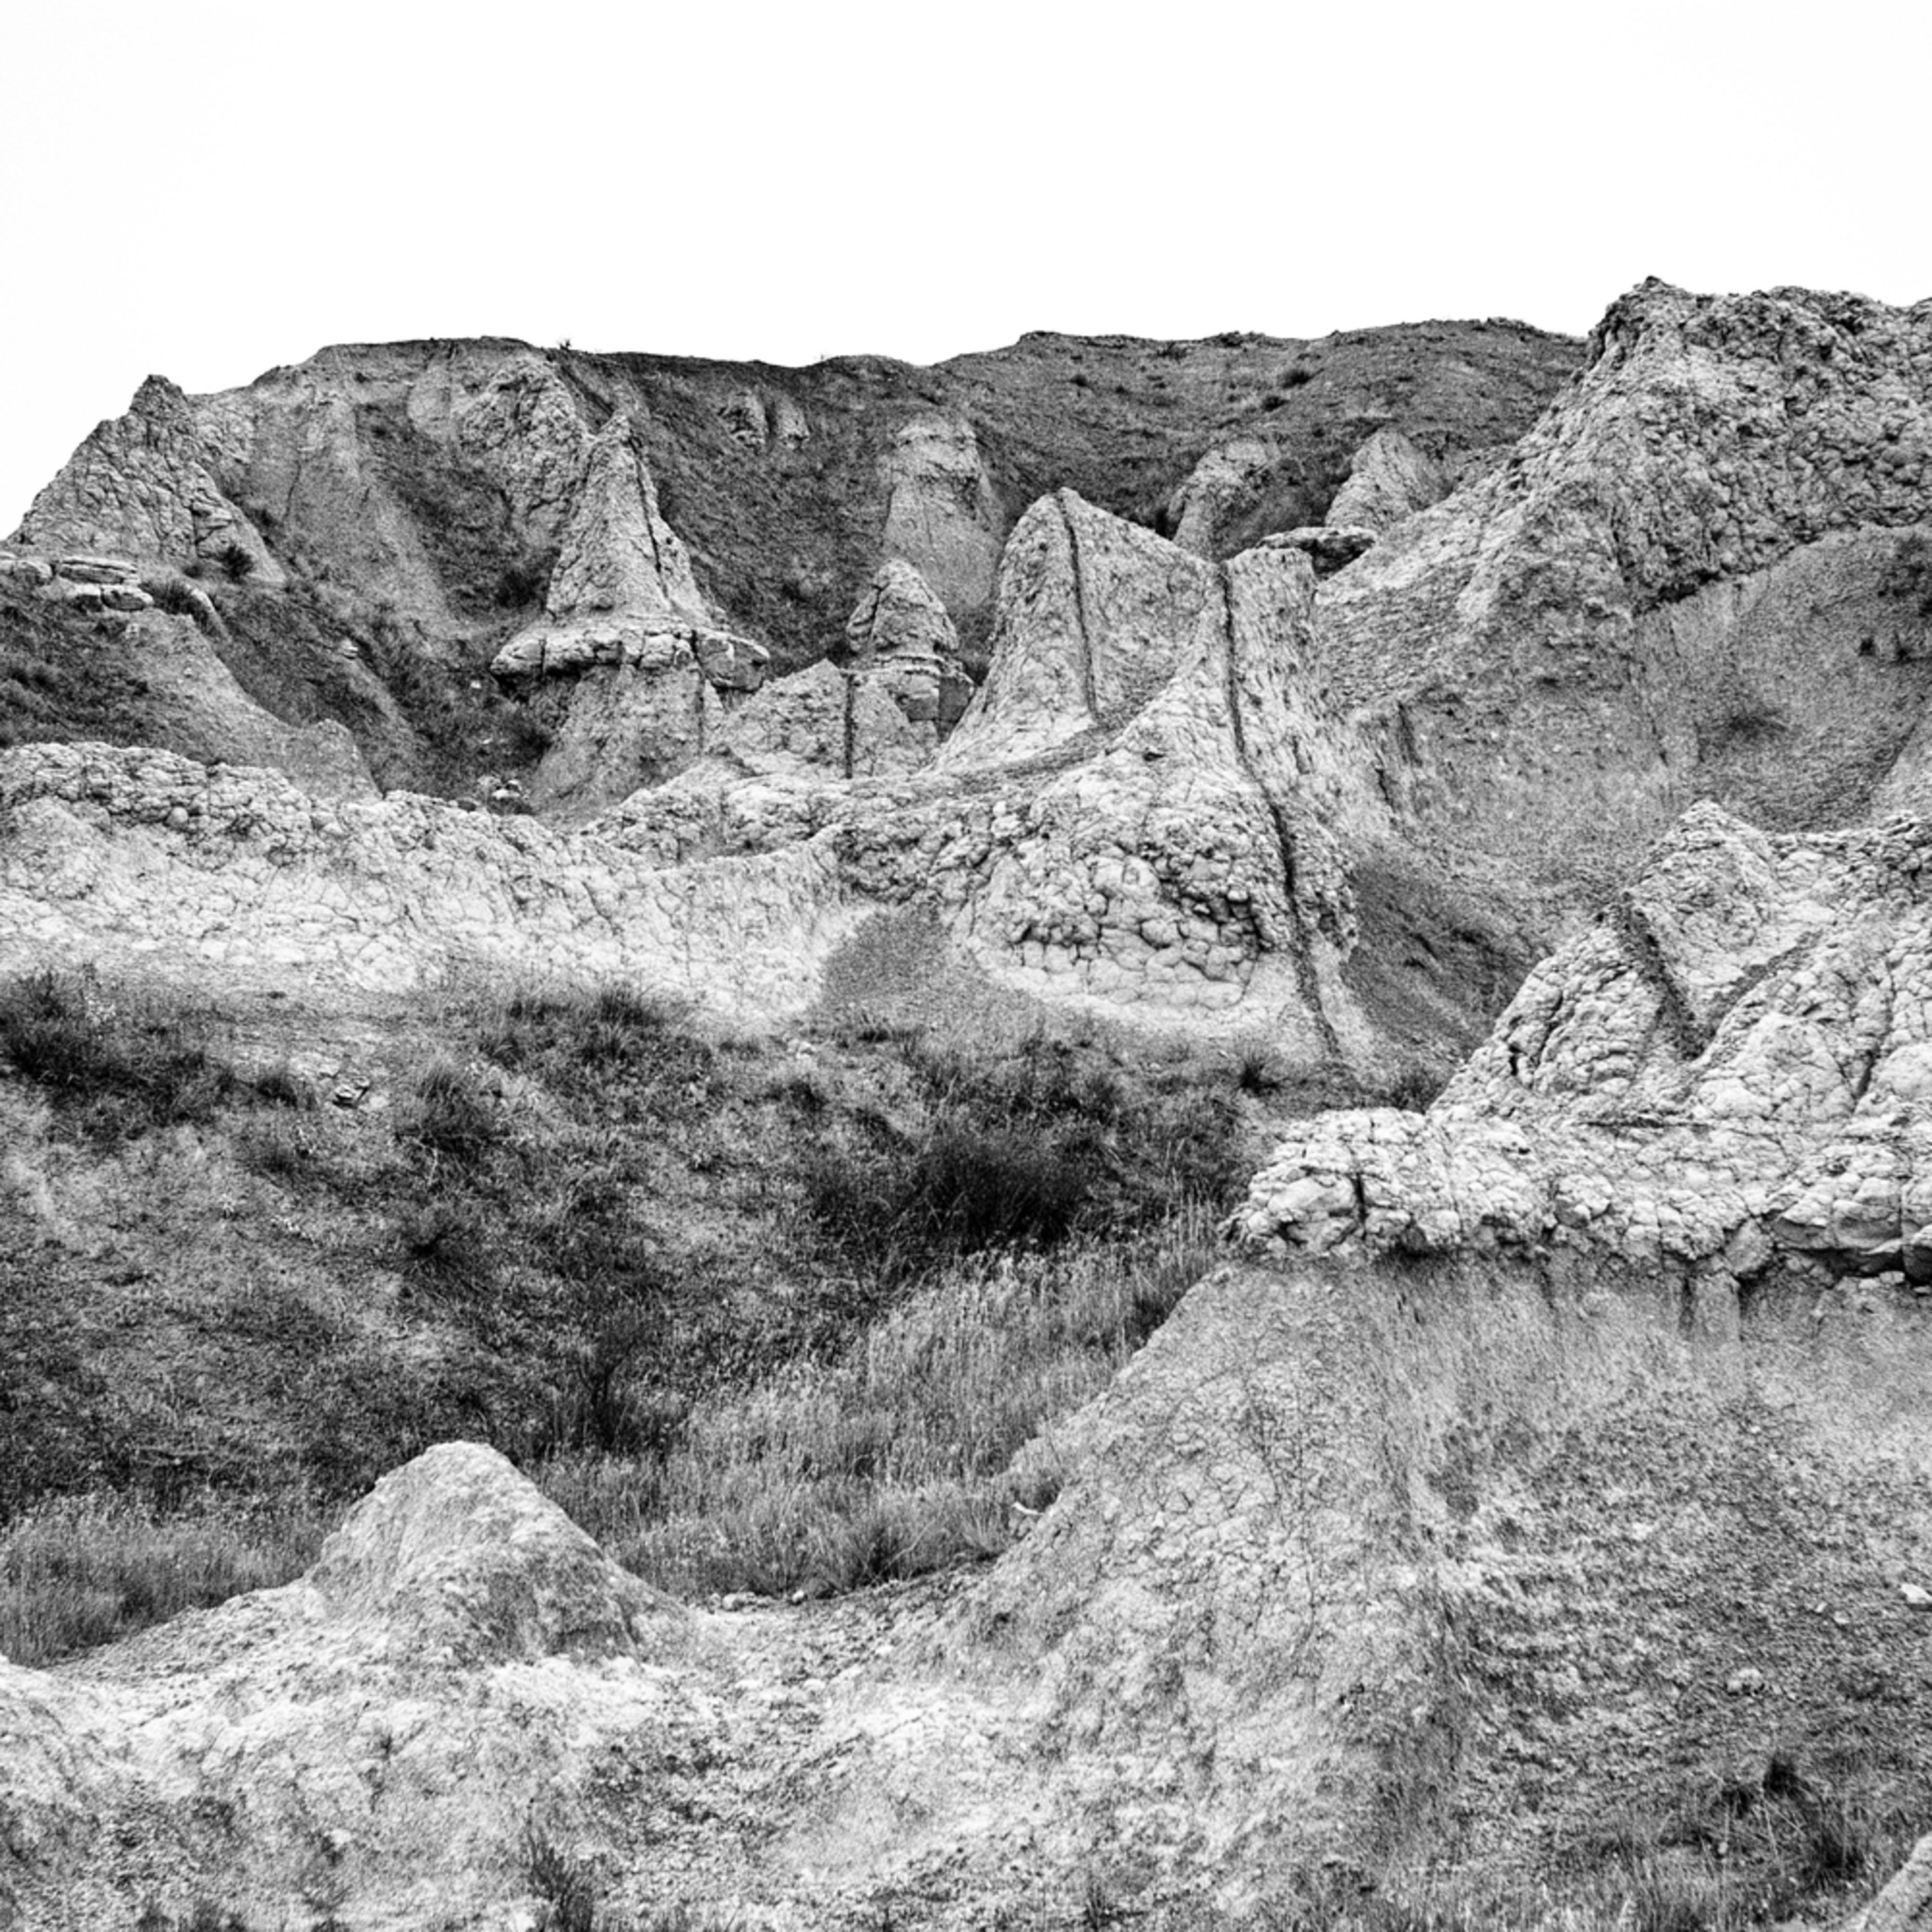 Dscf4555 edit edit badlands erosion cones bw bbg5pe